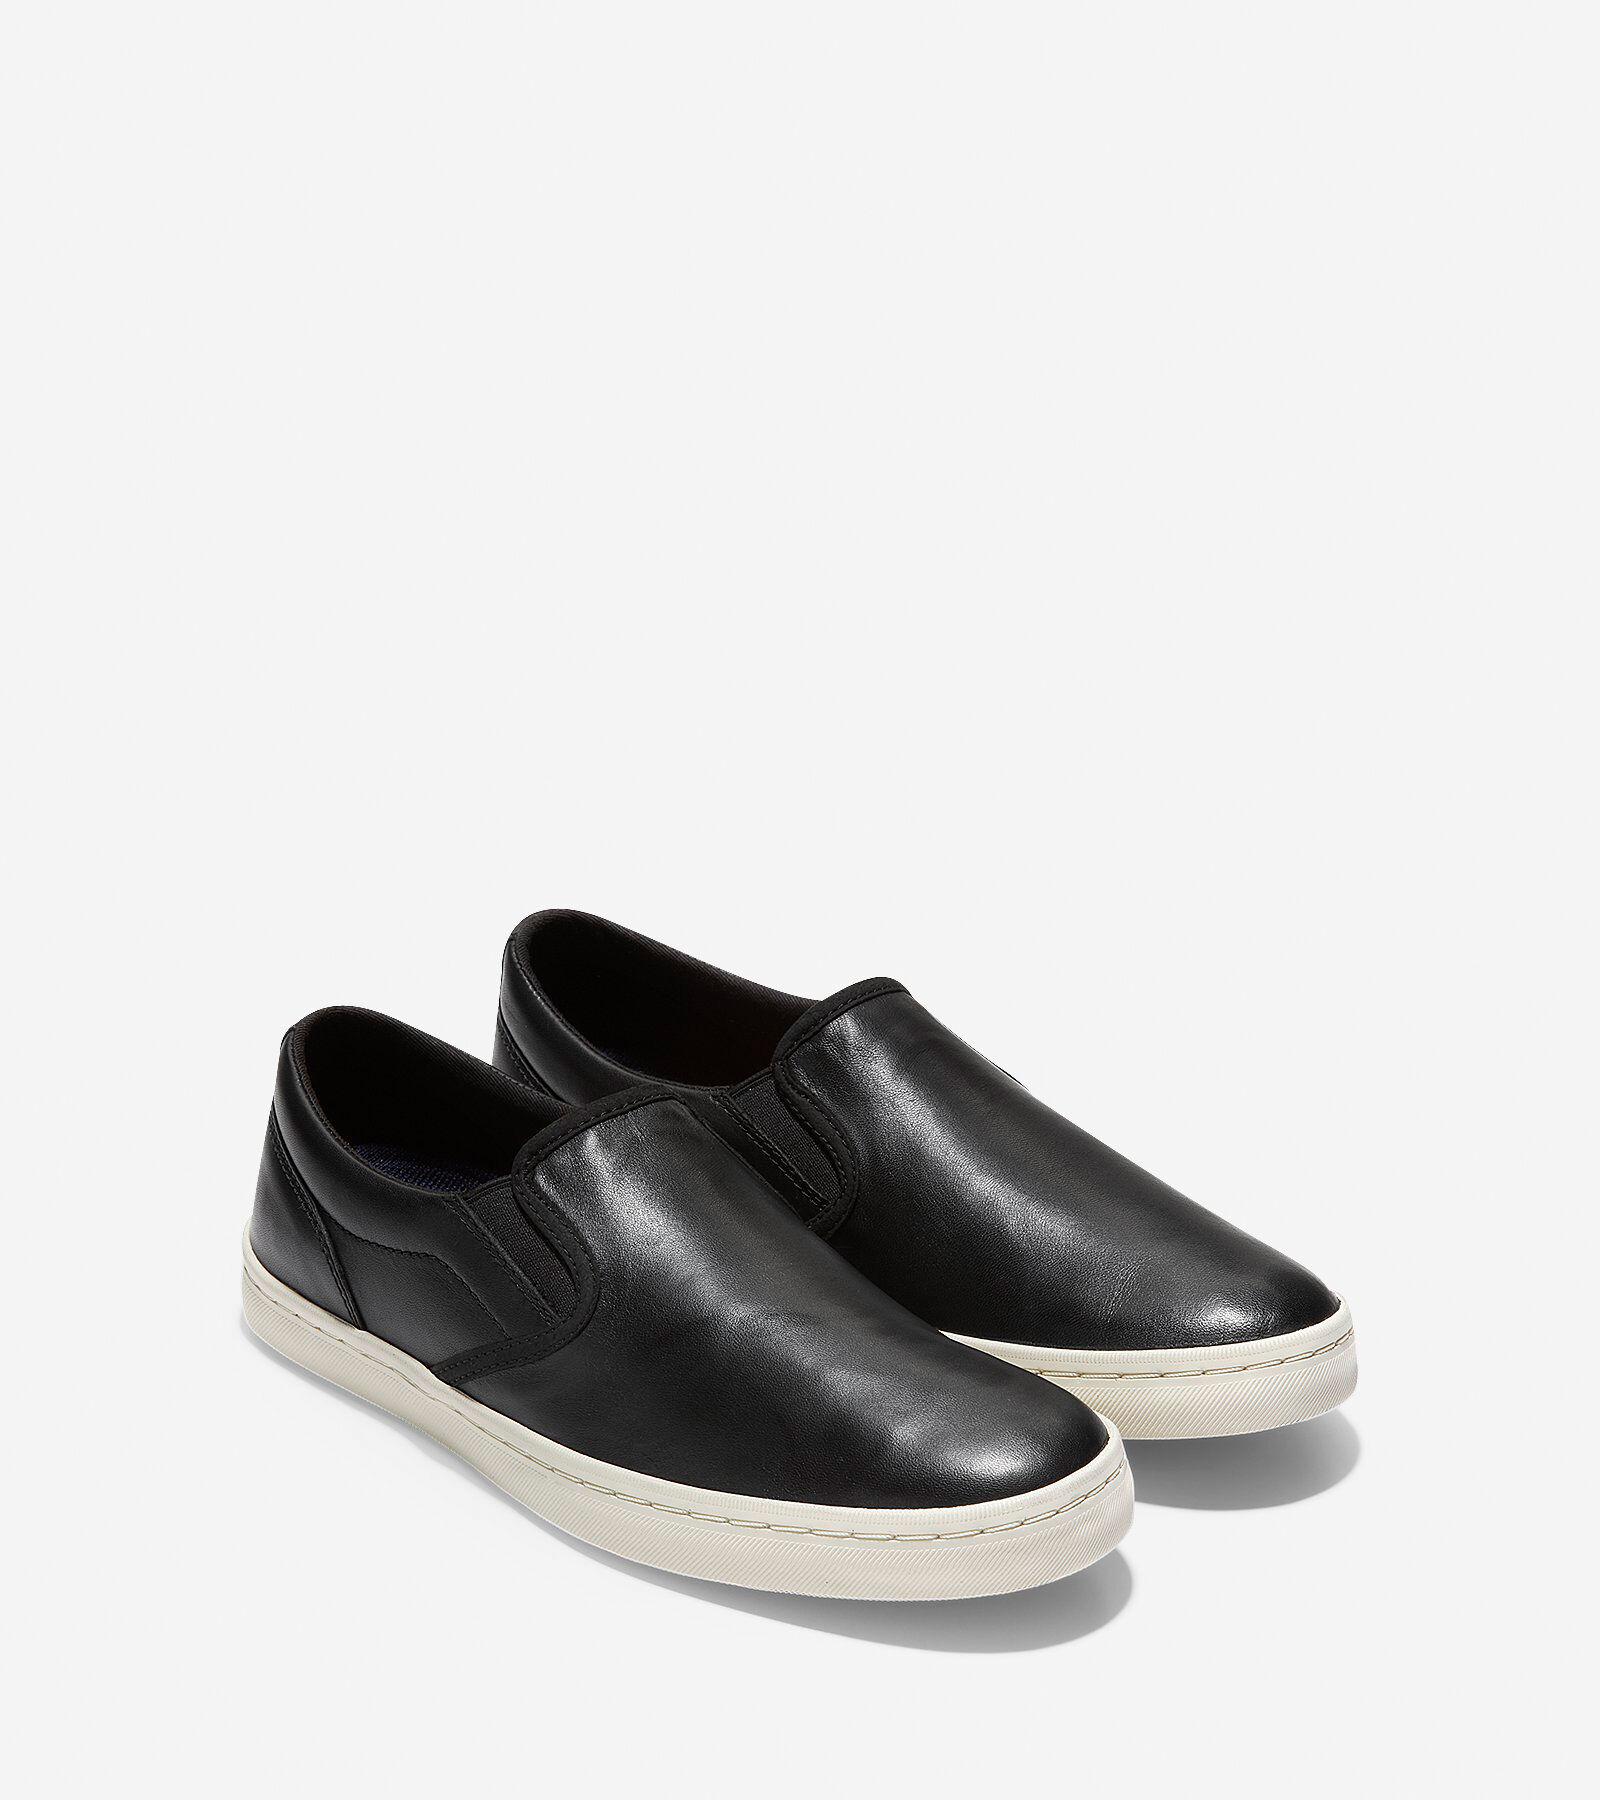 Nantucket Deck Slip-On Sneaker in Black